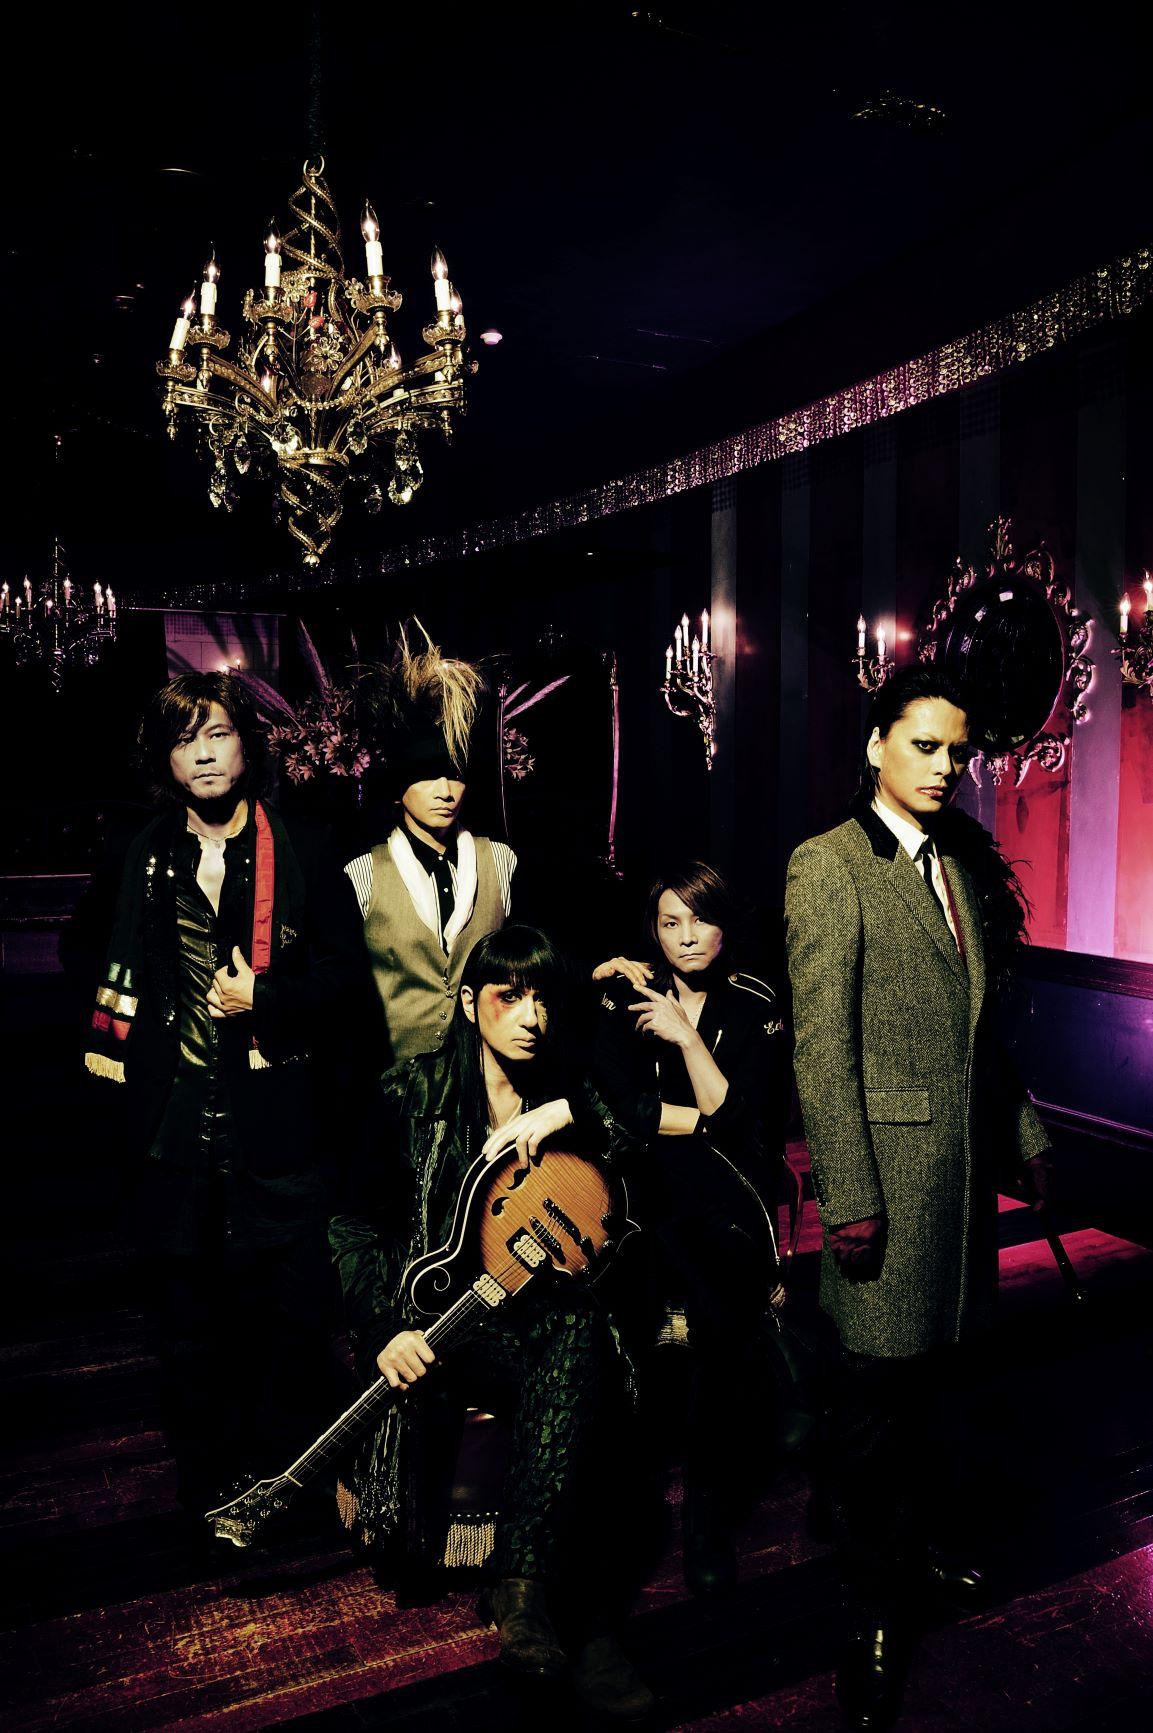 BUCK-TICK『B-T LIVE PRODUCT -Ariola YEARS-』10枚組Blu-ray Boxの全収録内容解禁